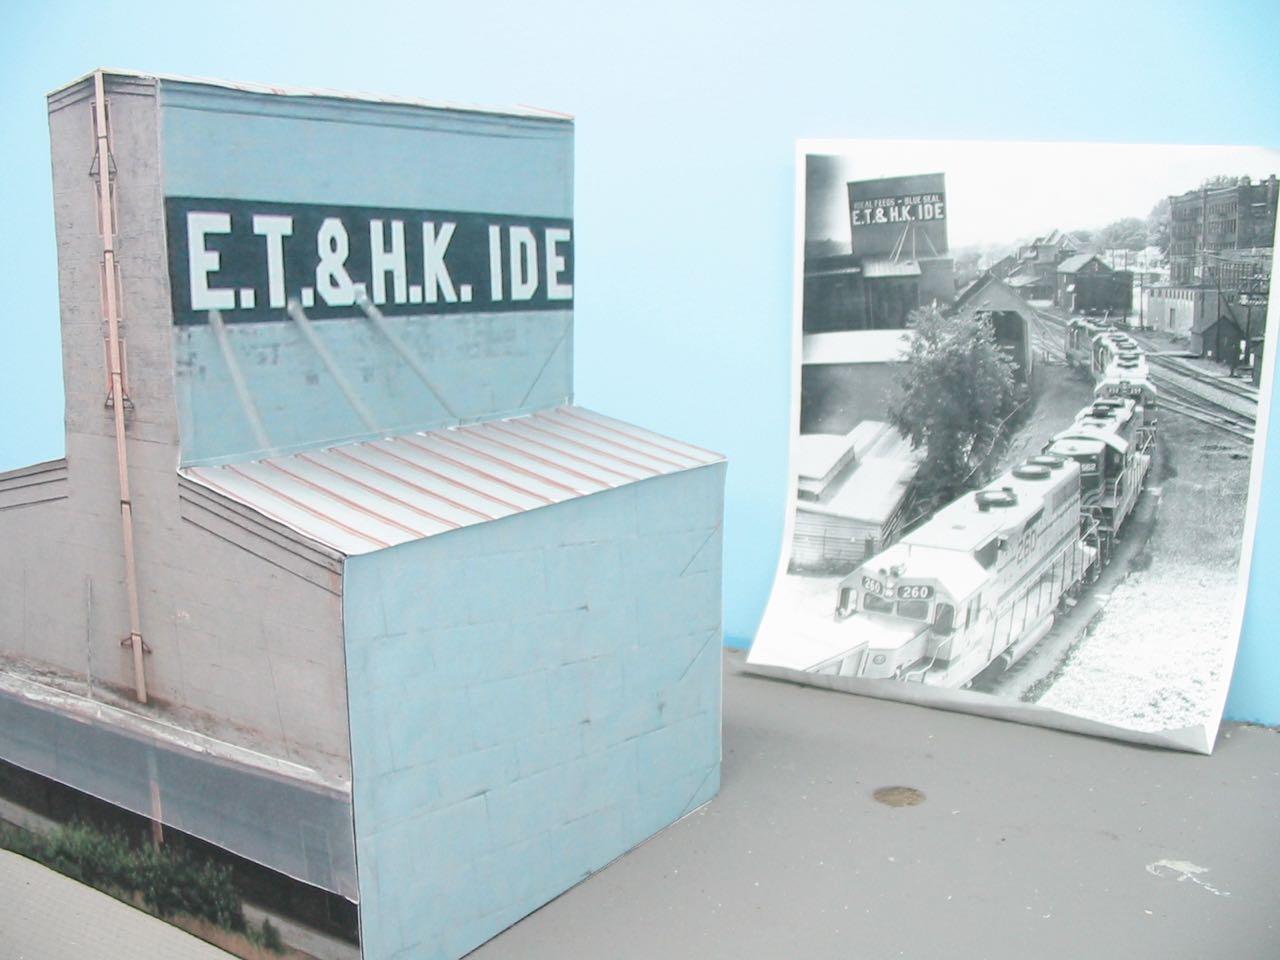 Mike mcnamara's northeast kingdom model railroad: et & hk ide building